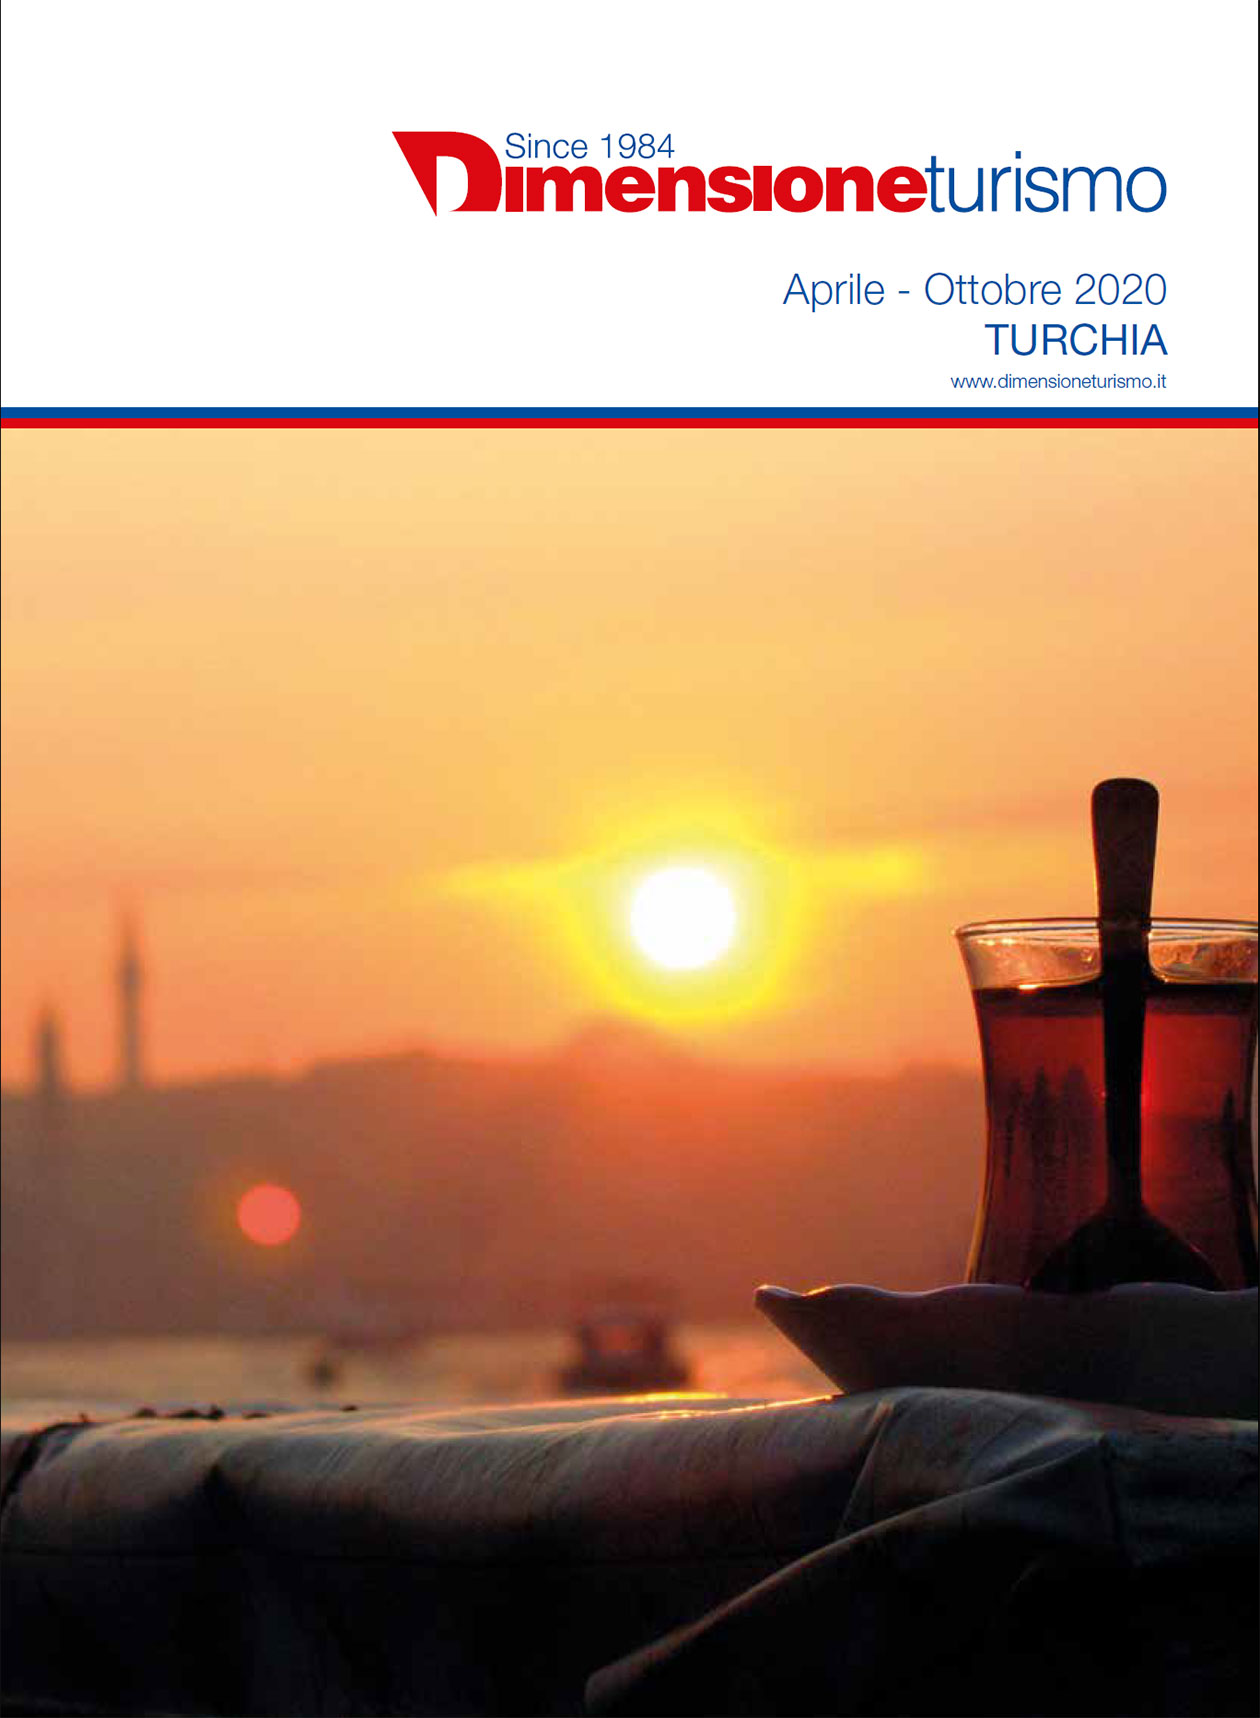 Copertina brochure Turchia